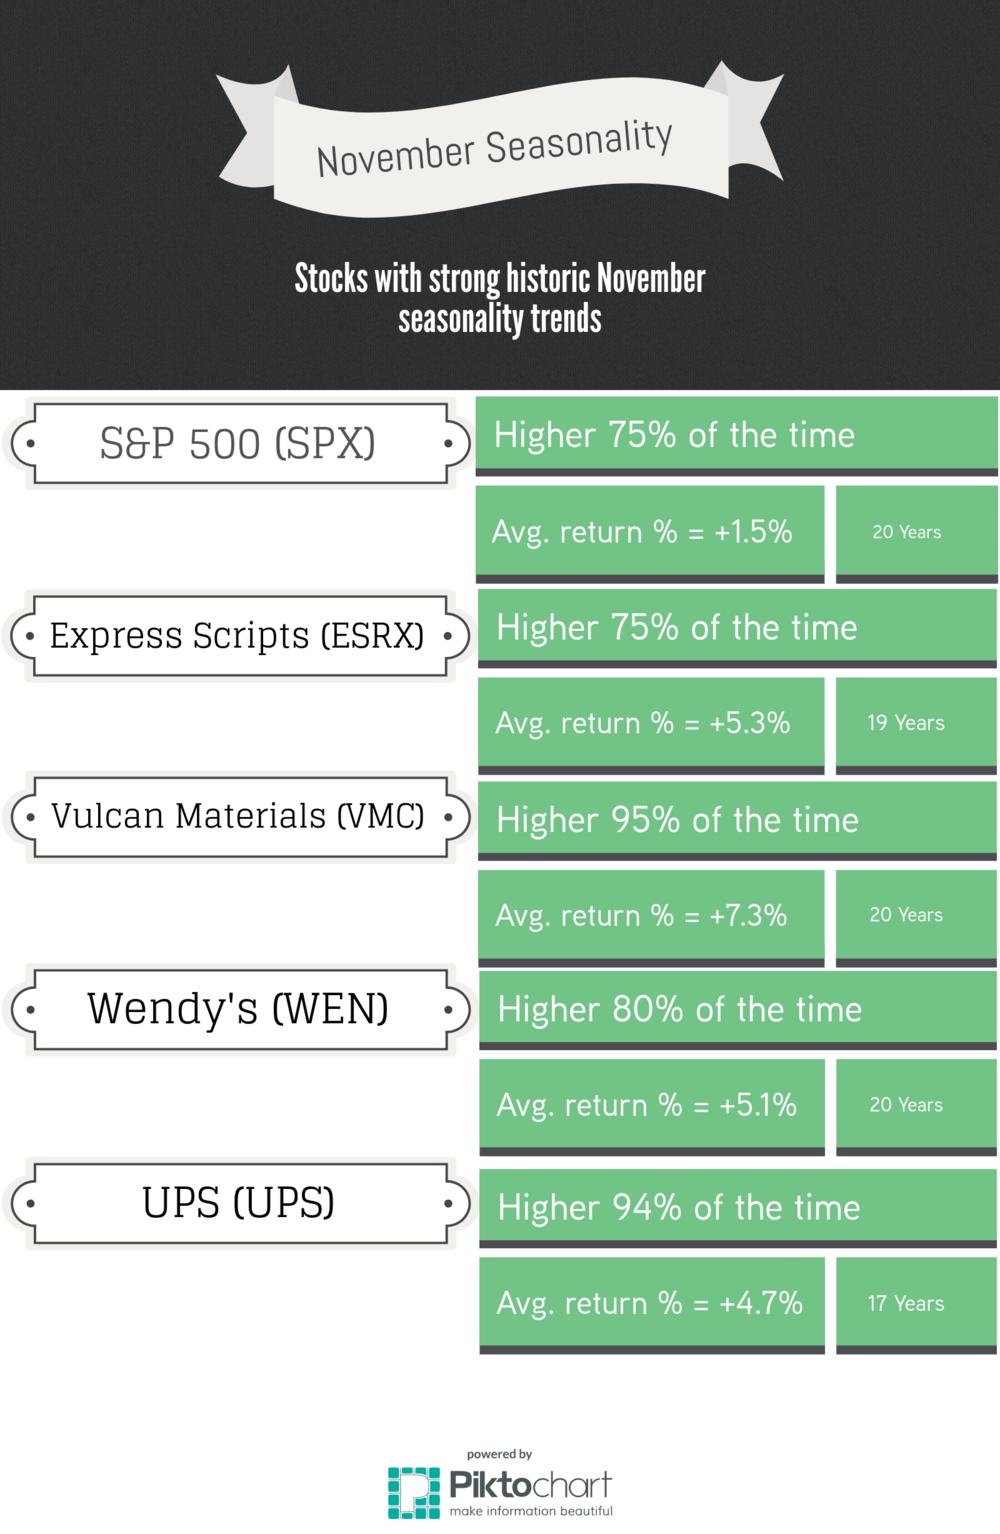 Stock/Index November seasonality